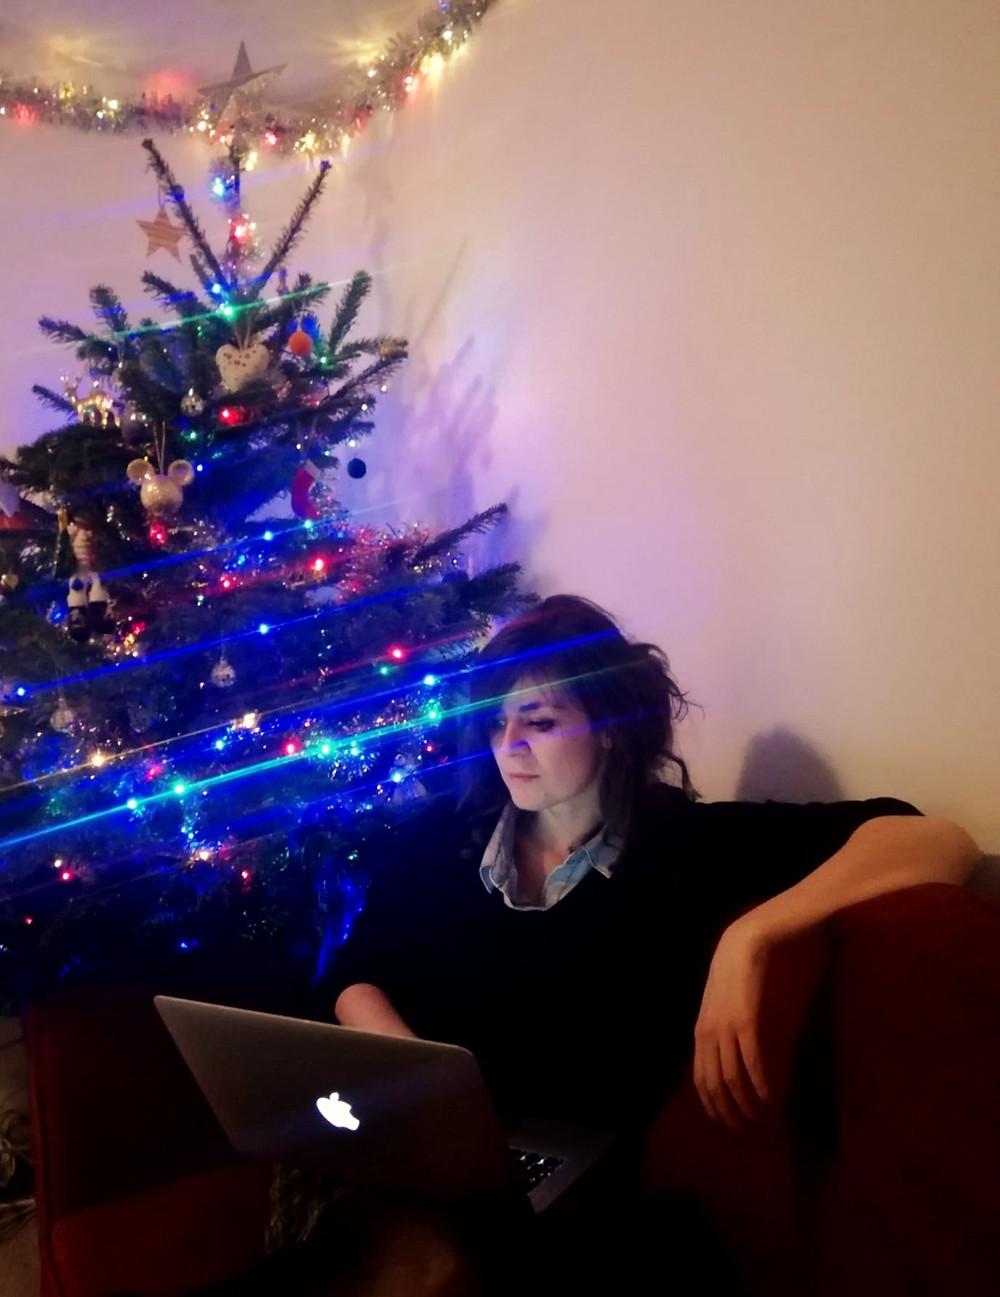 Hannah Duncan Christmas writing, Christmas tree, laptop, young woman, apple computer, on a red sofa, tinsel and lights, copywriter at Christmas